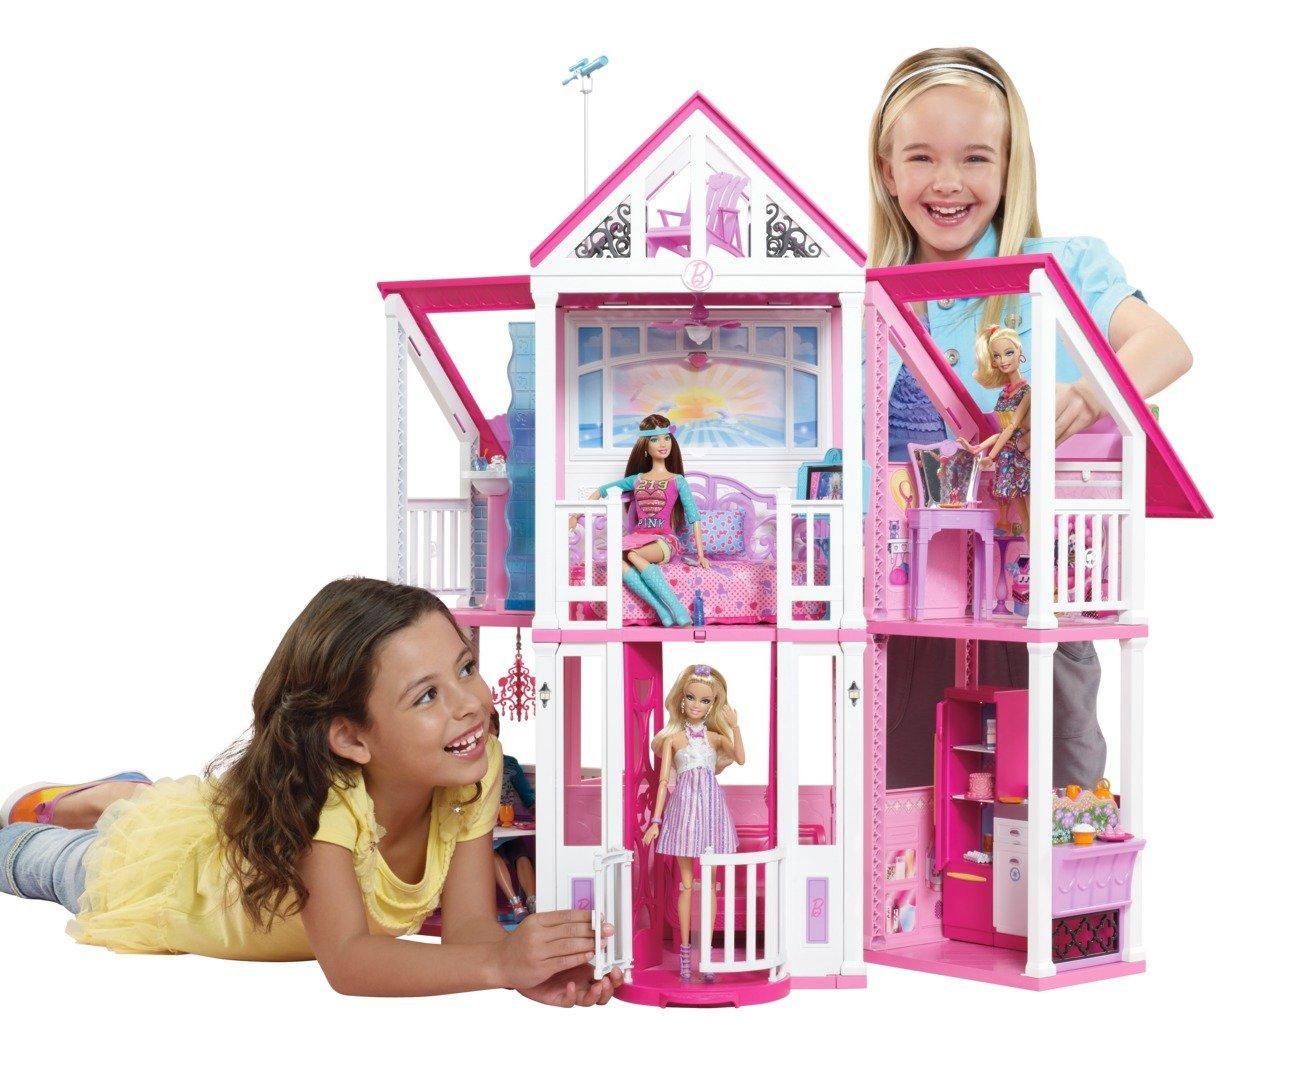 Barbie malibu dreamhouse the perfect barbie dollhouse - Casa para barbies ...